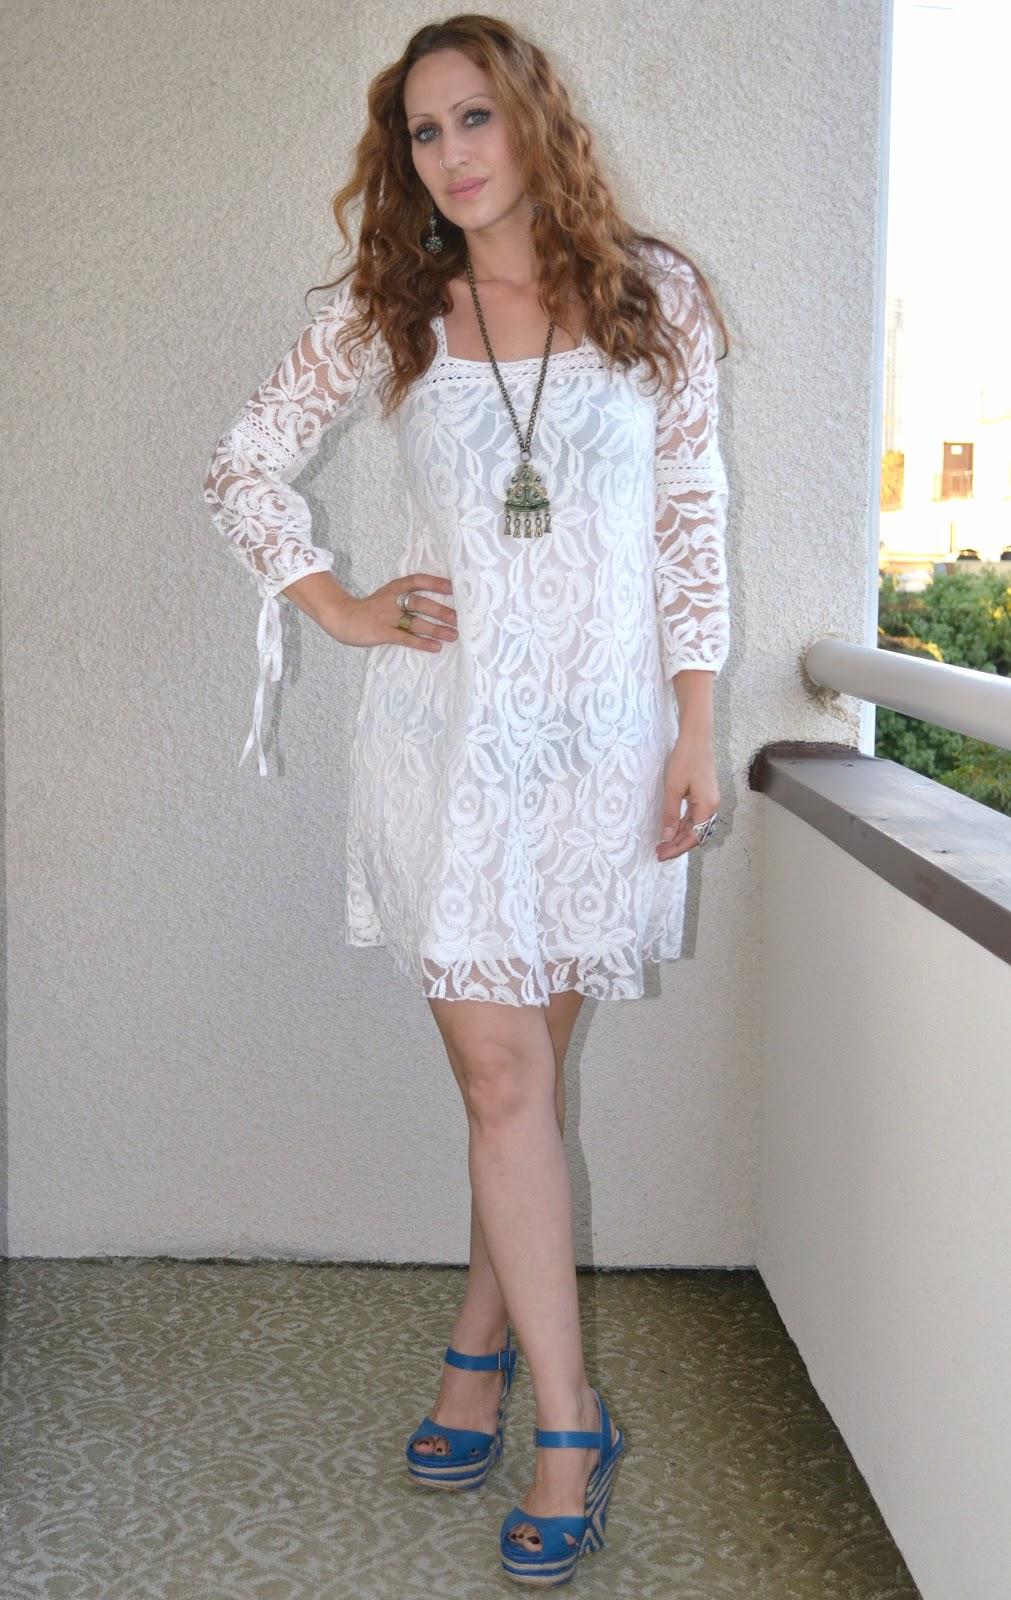 Jessa From Girls Wedding Dress Dresses For Woman